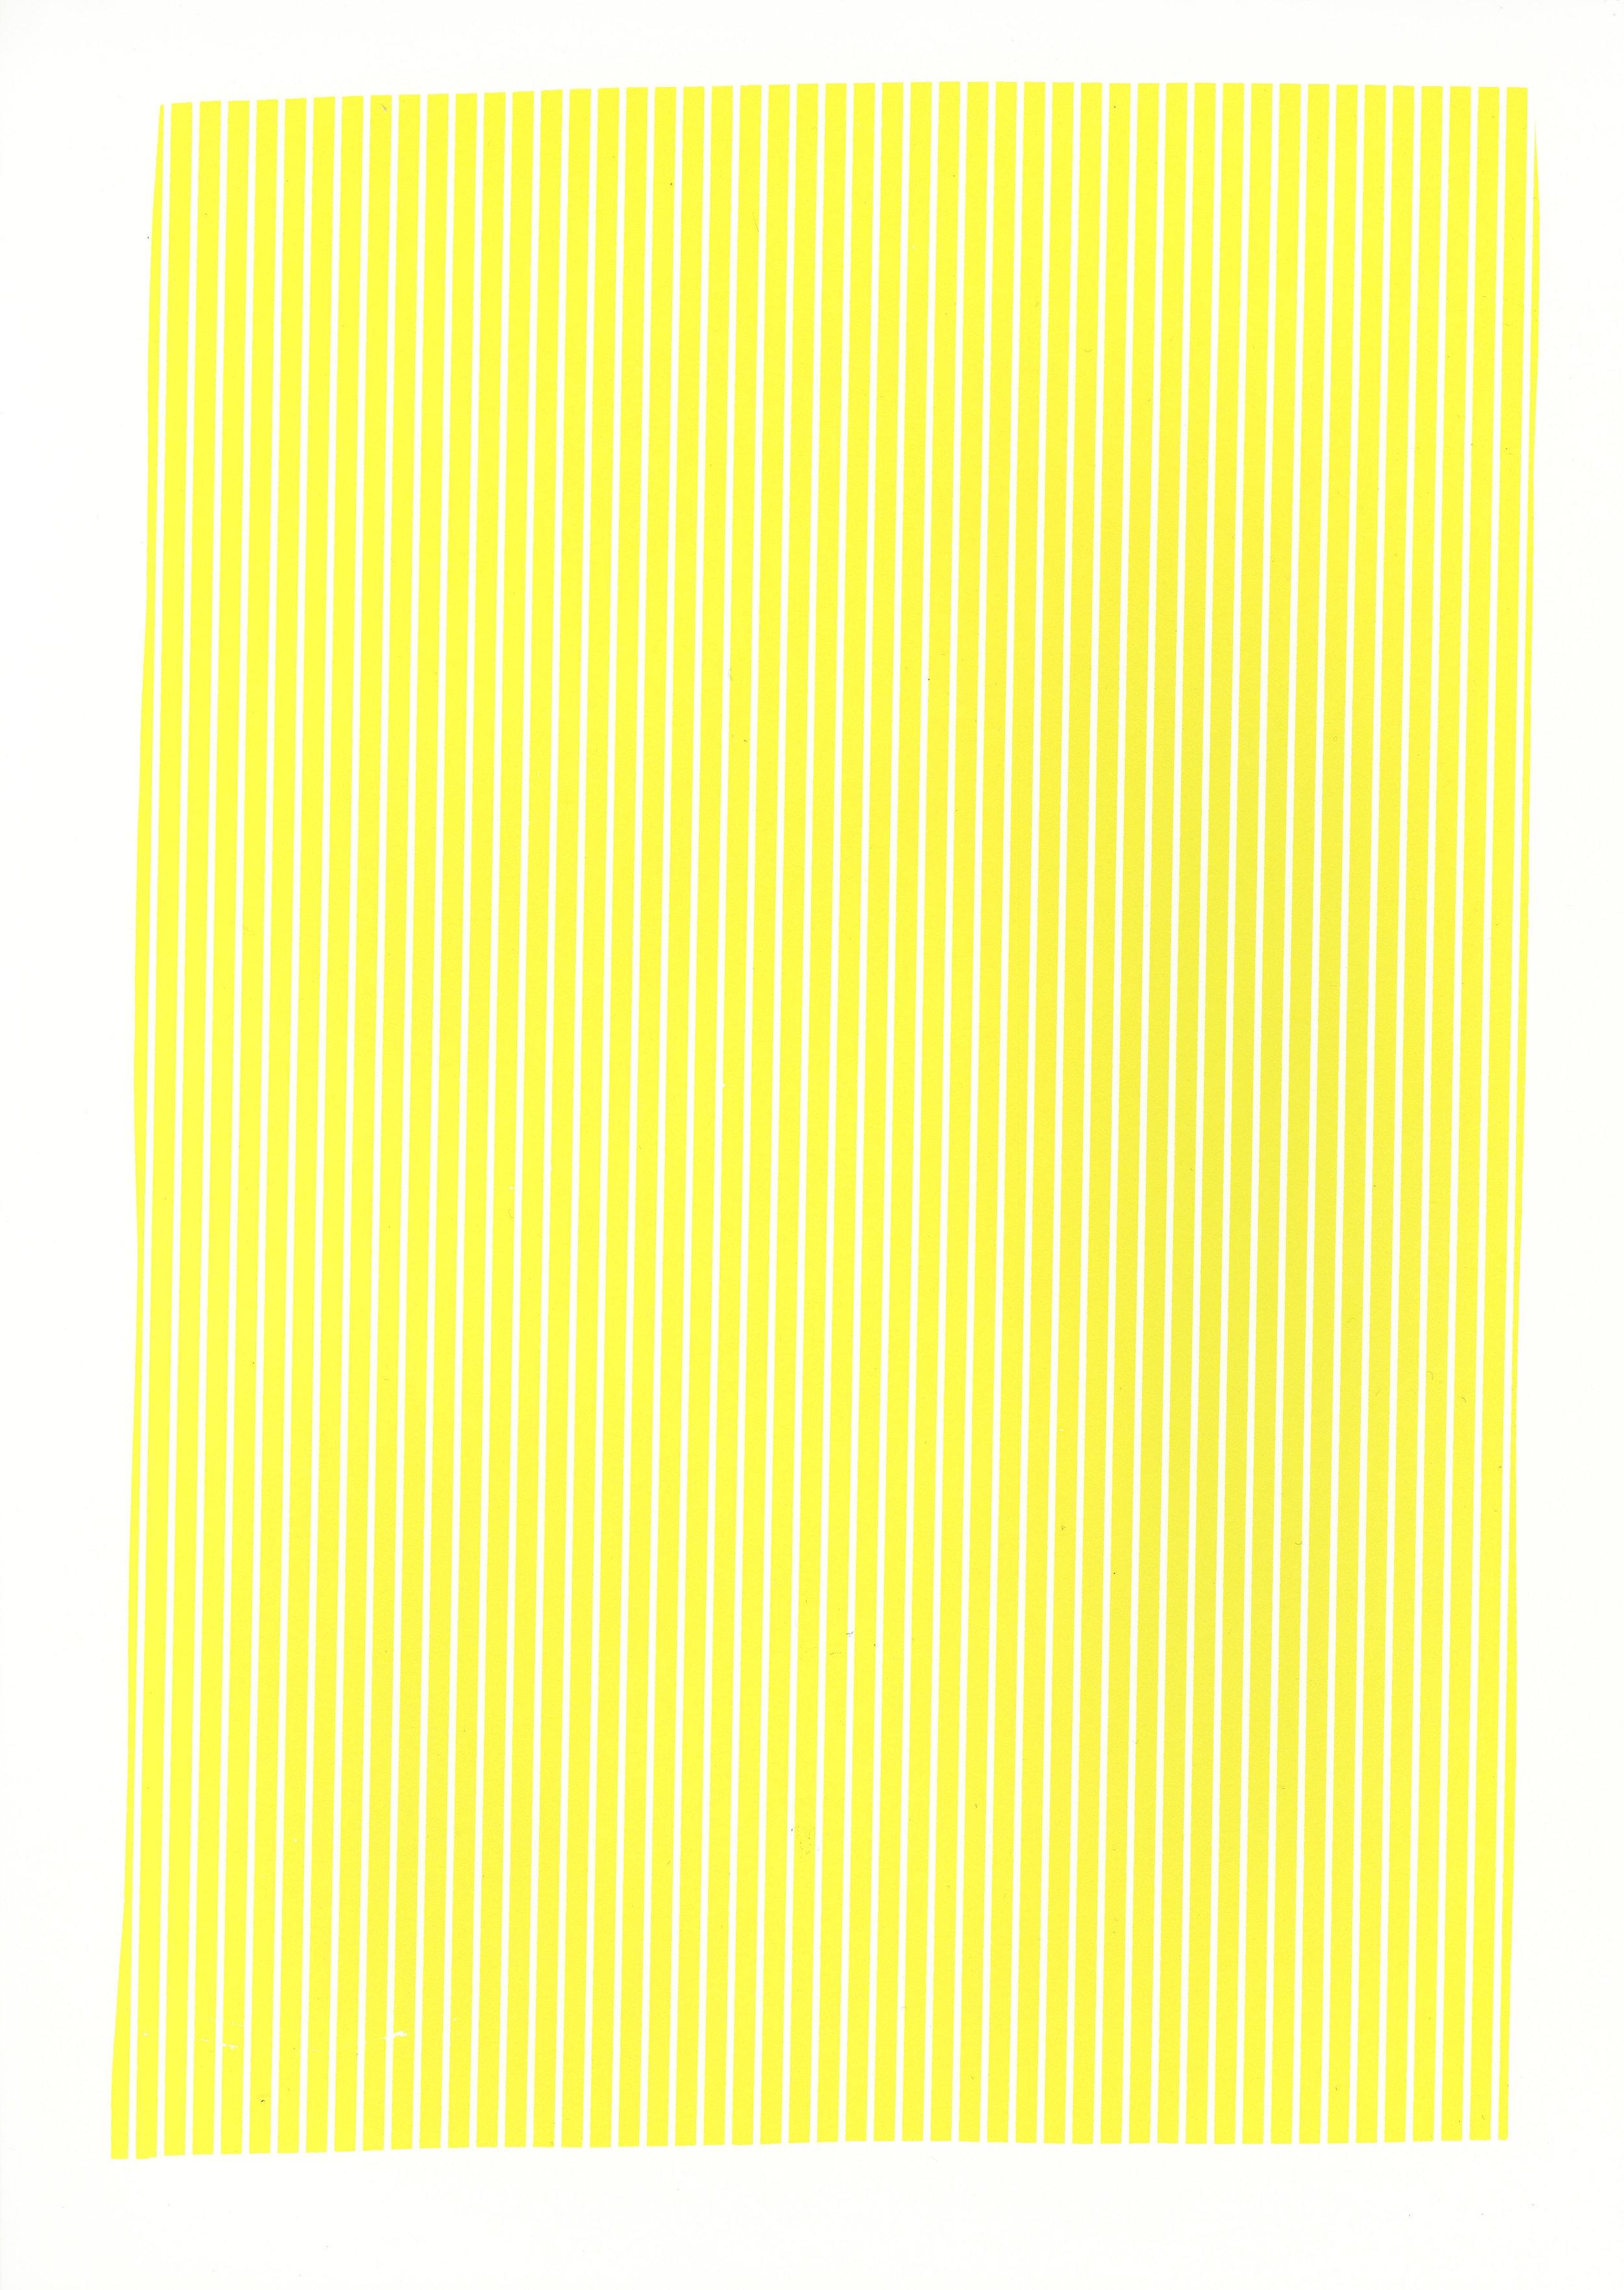 "Yellow study,2017, silkscreen, 19"" x 12.5"""